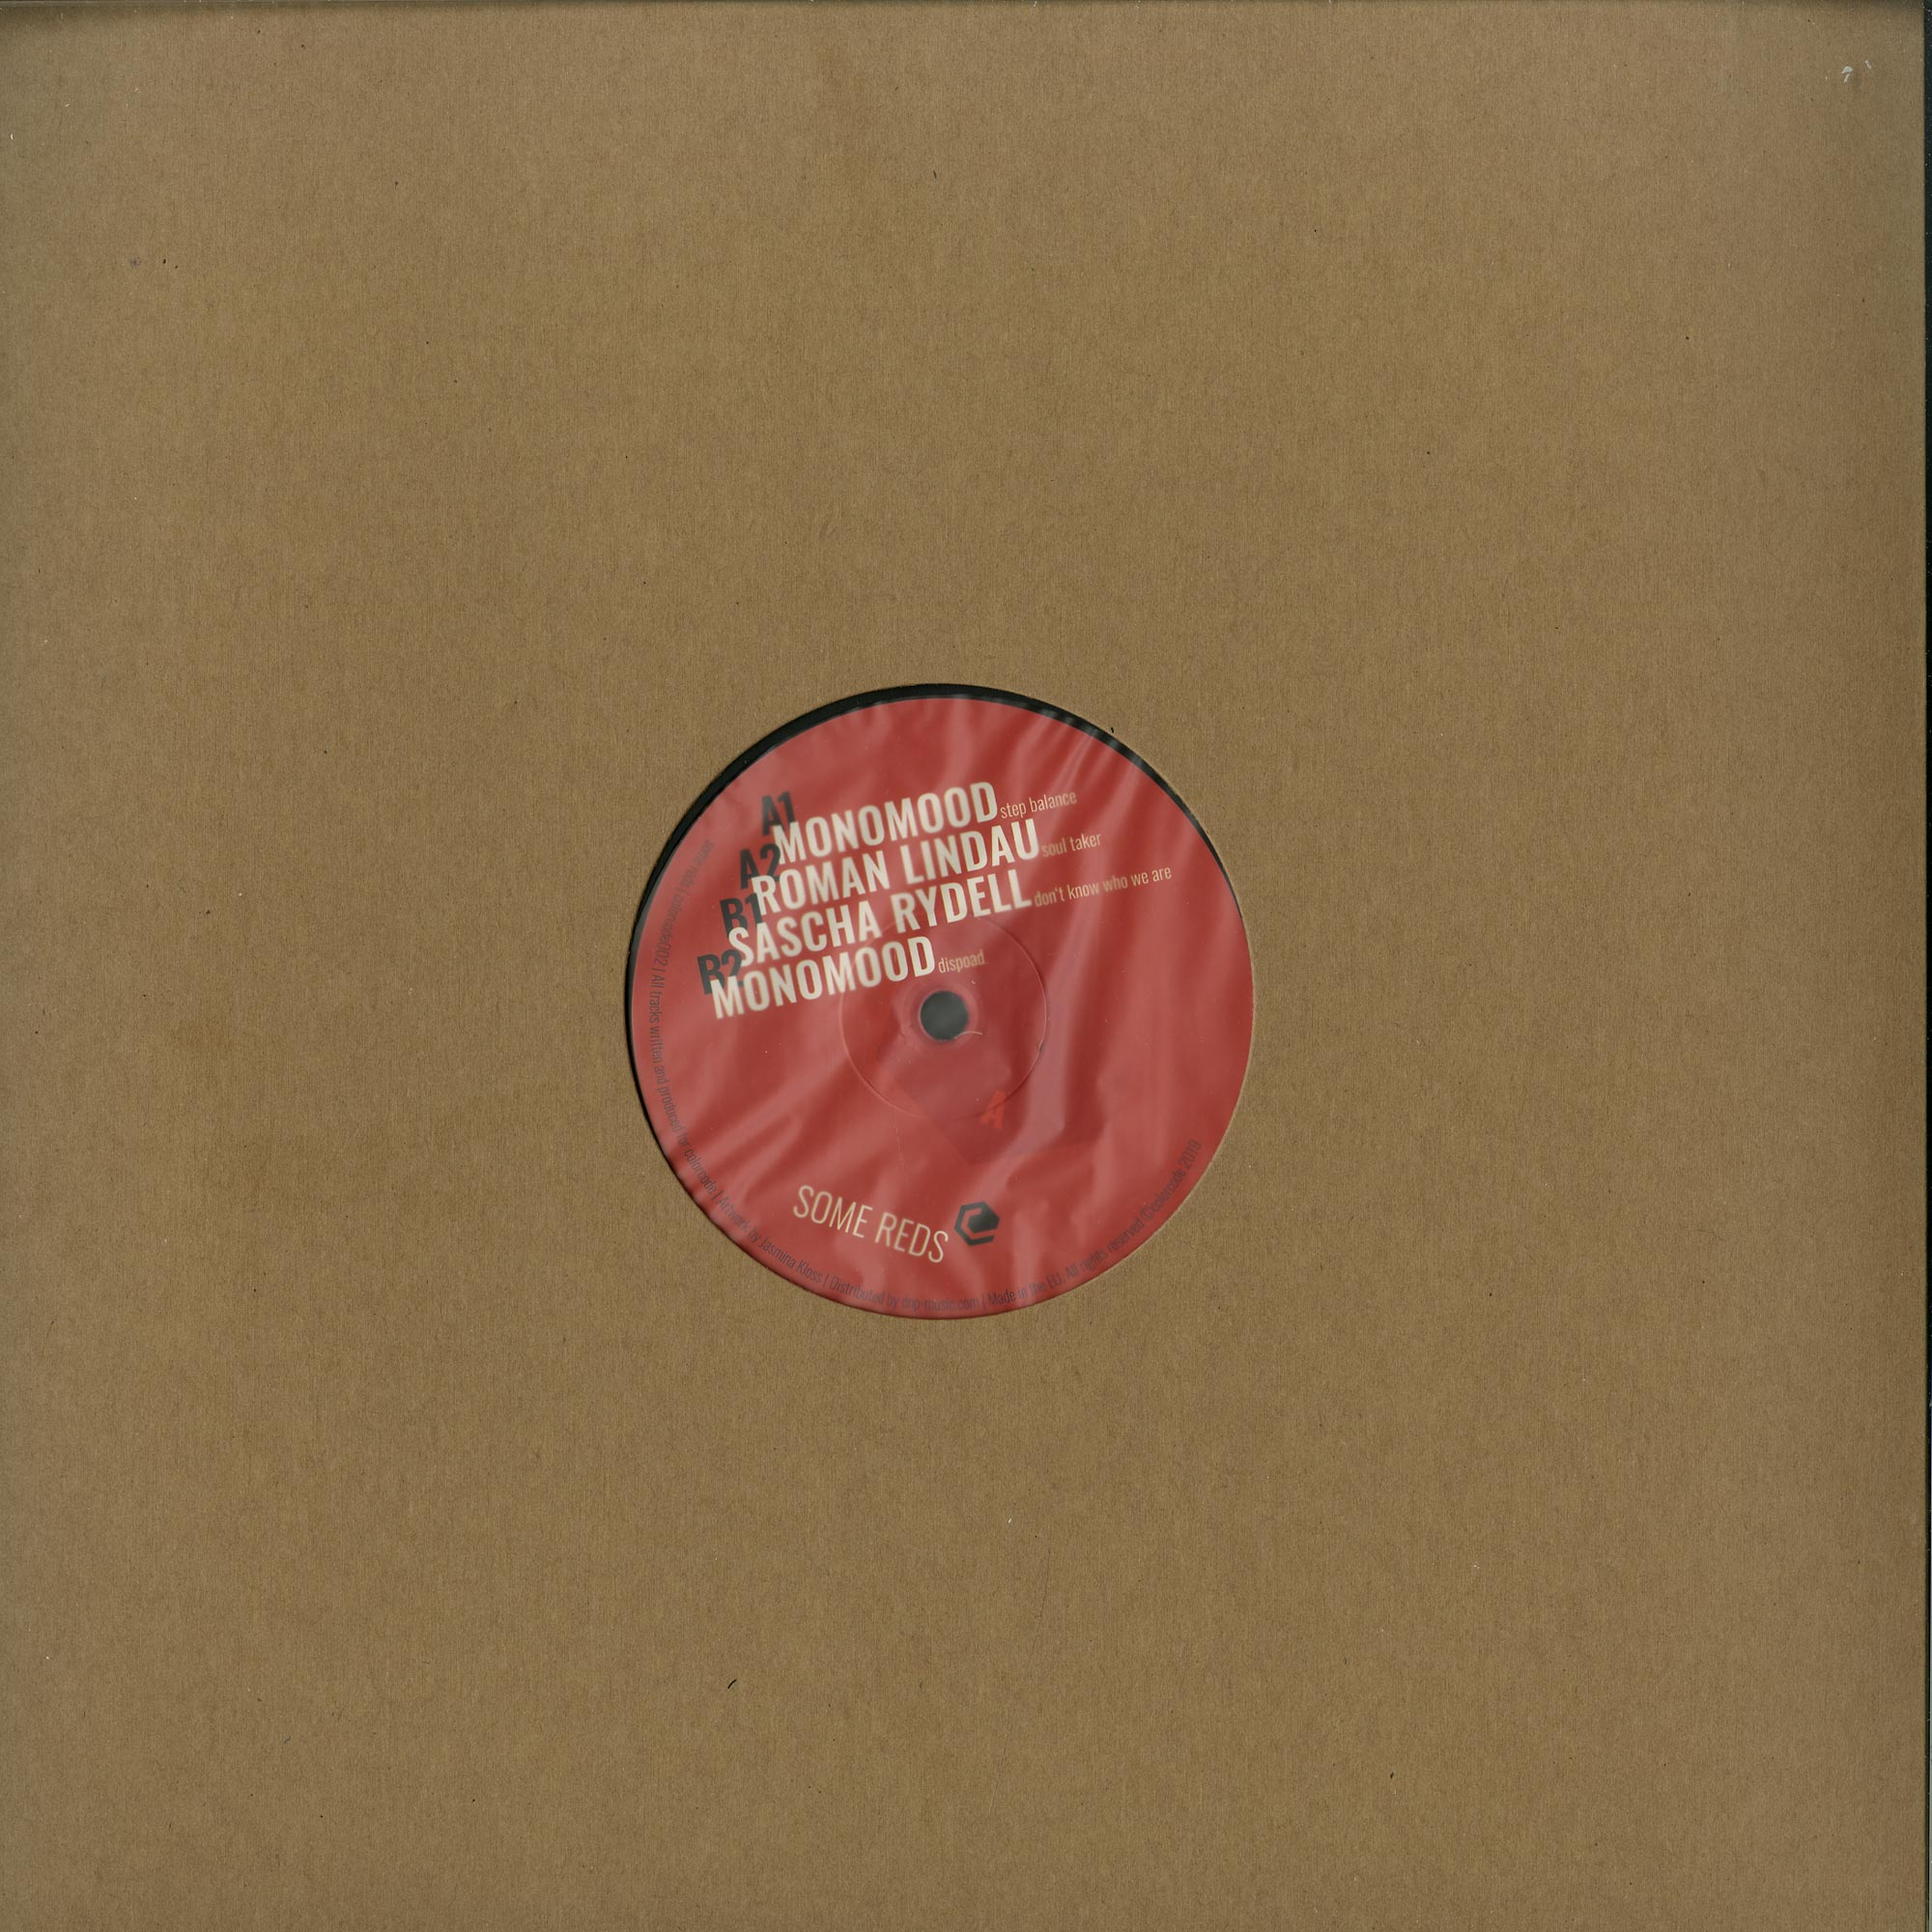 Roman Lindau / Sascha Rydell / Monomood - SOME REDS